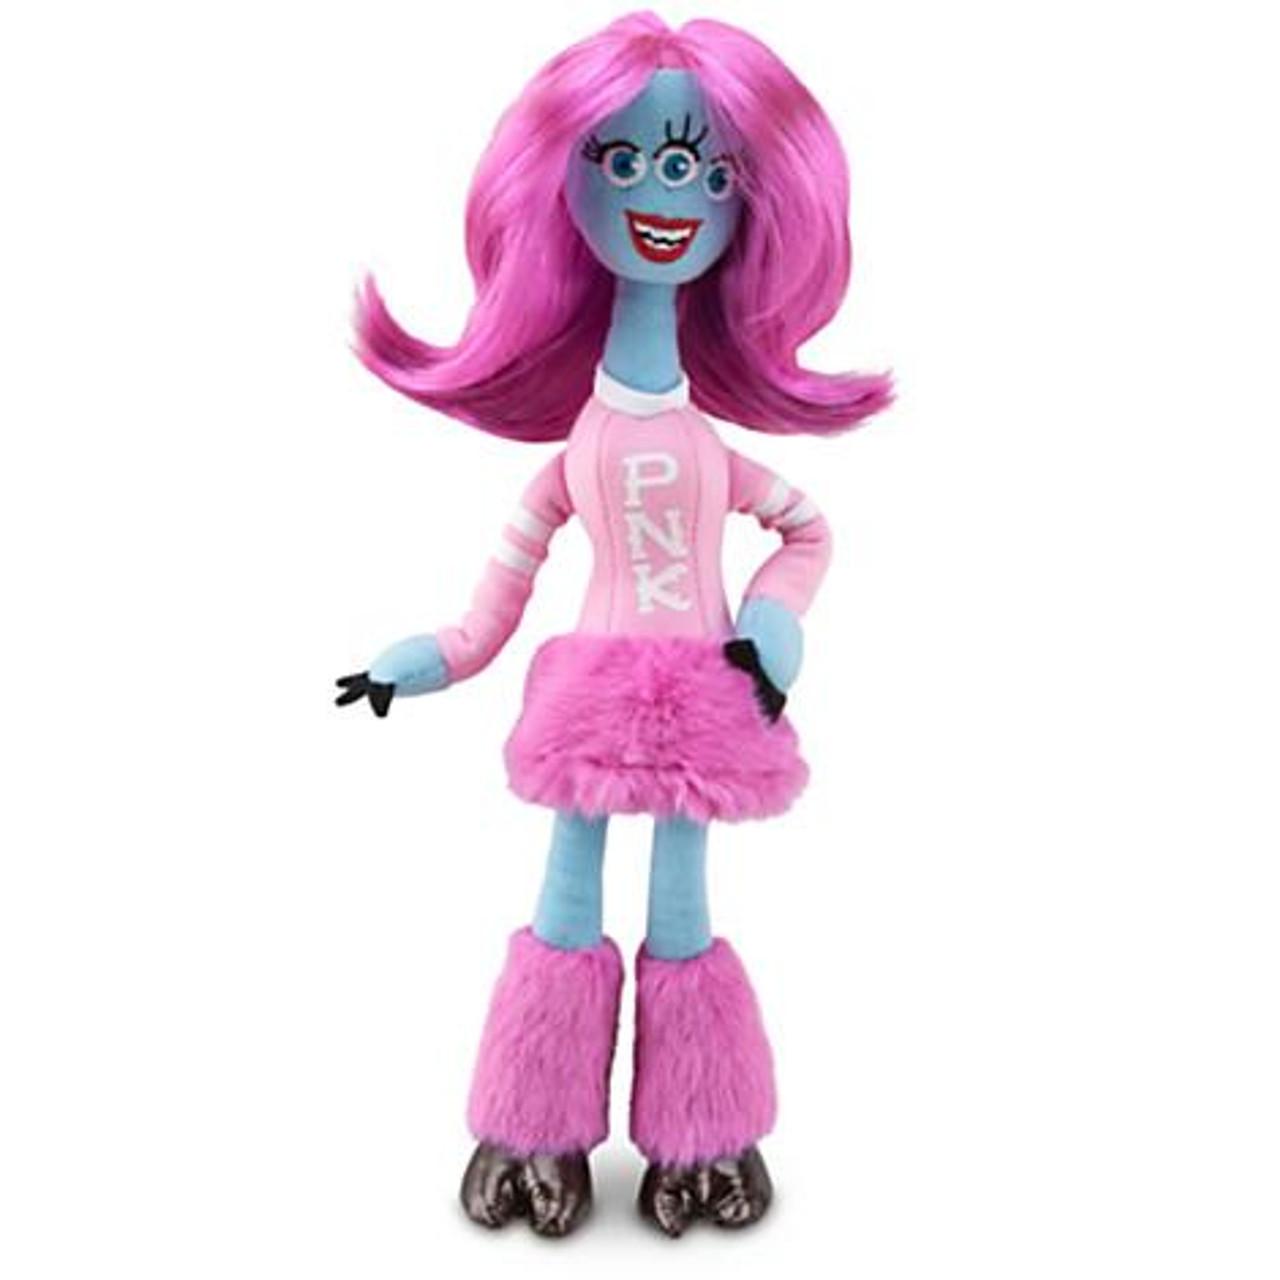 Disney / Pixar Monsters University Britney Exclusive 11.5-Inch Plush Doll